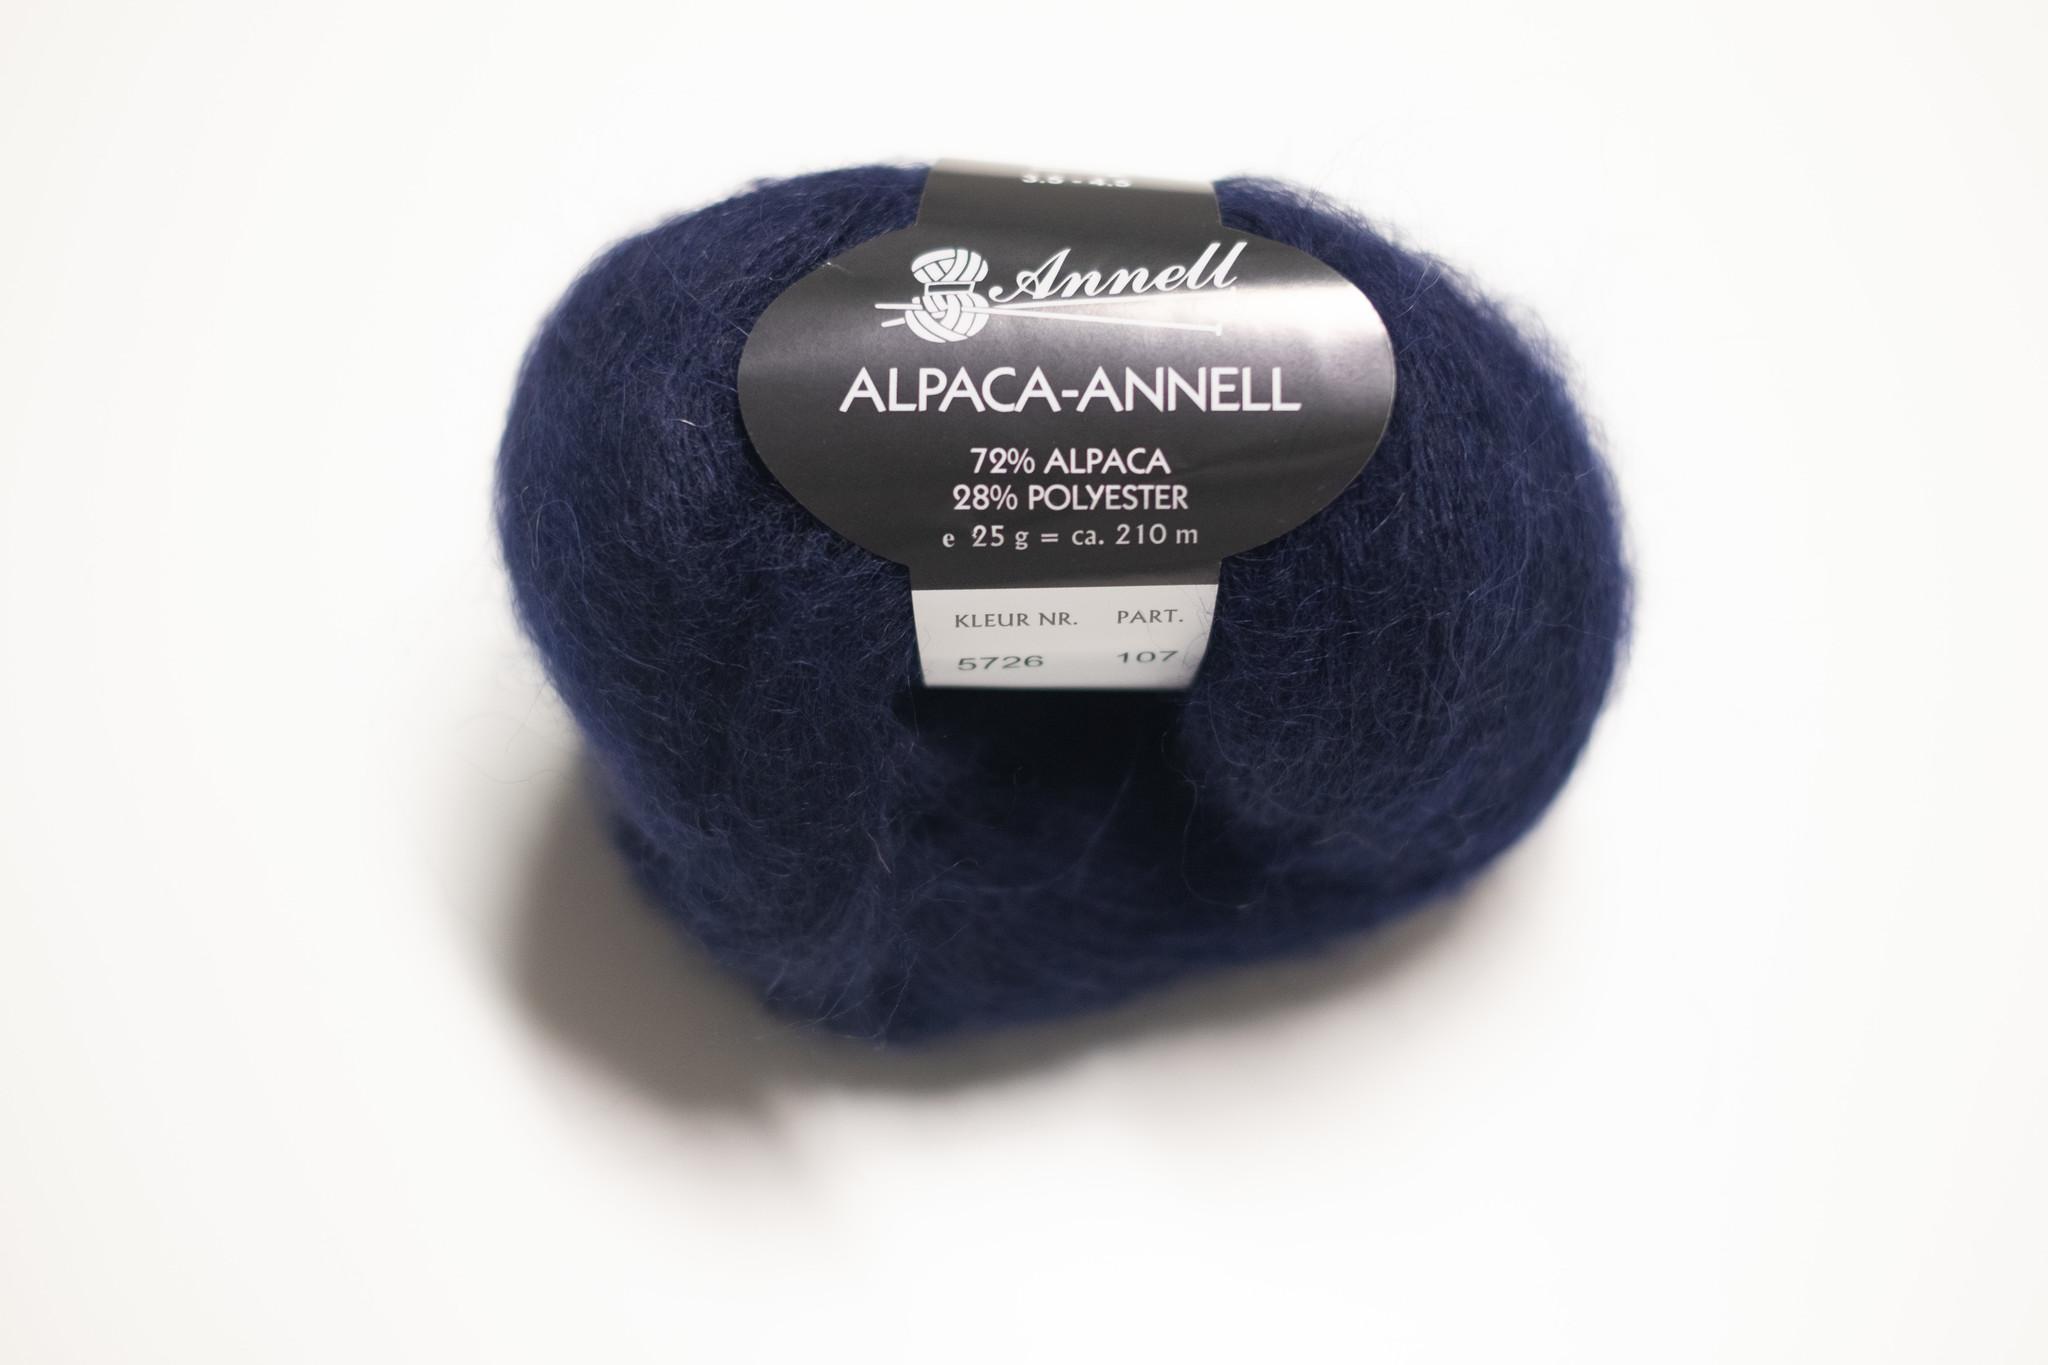 Annell Alpaca-Annell - kleur 5726